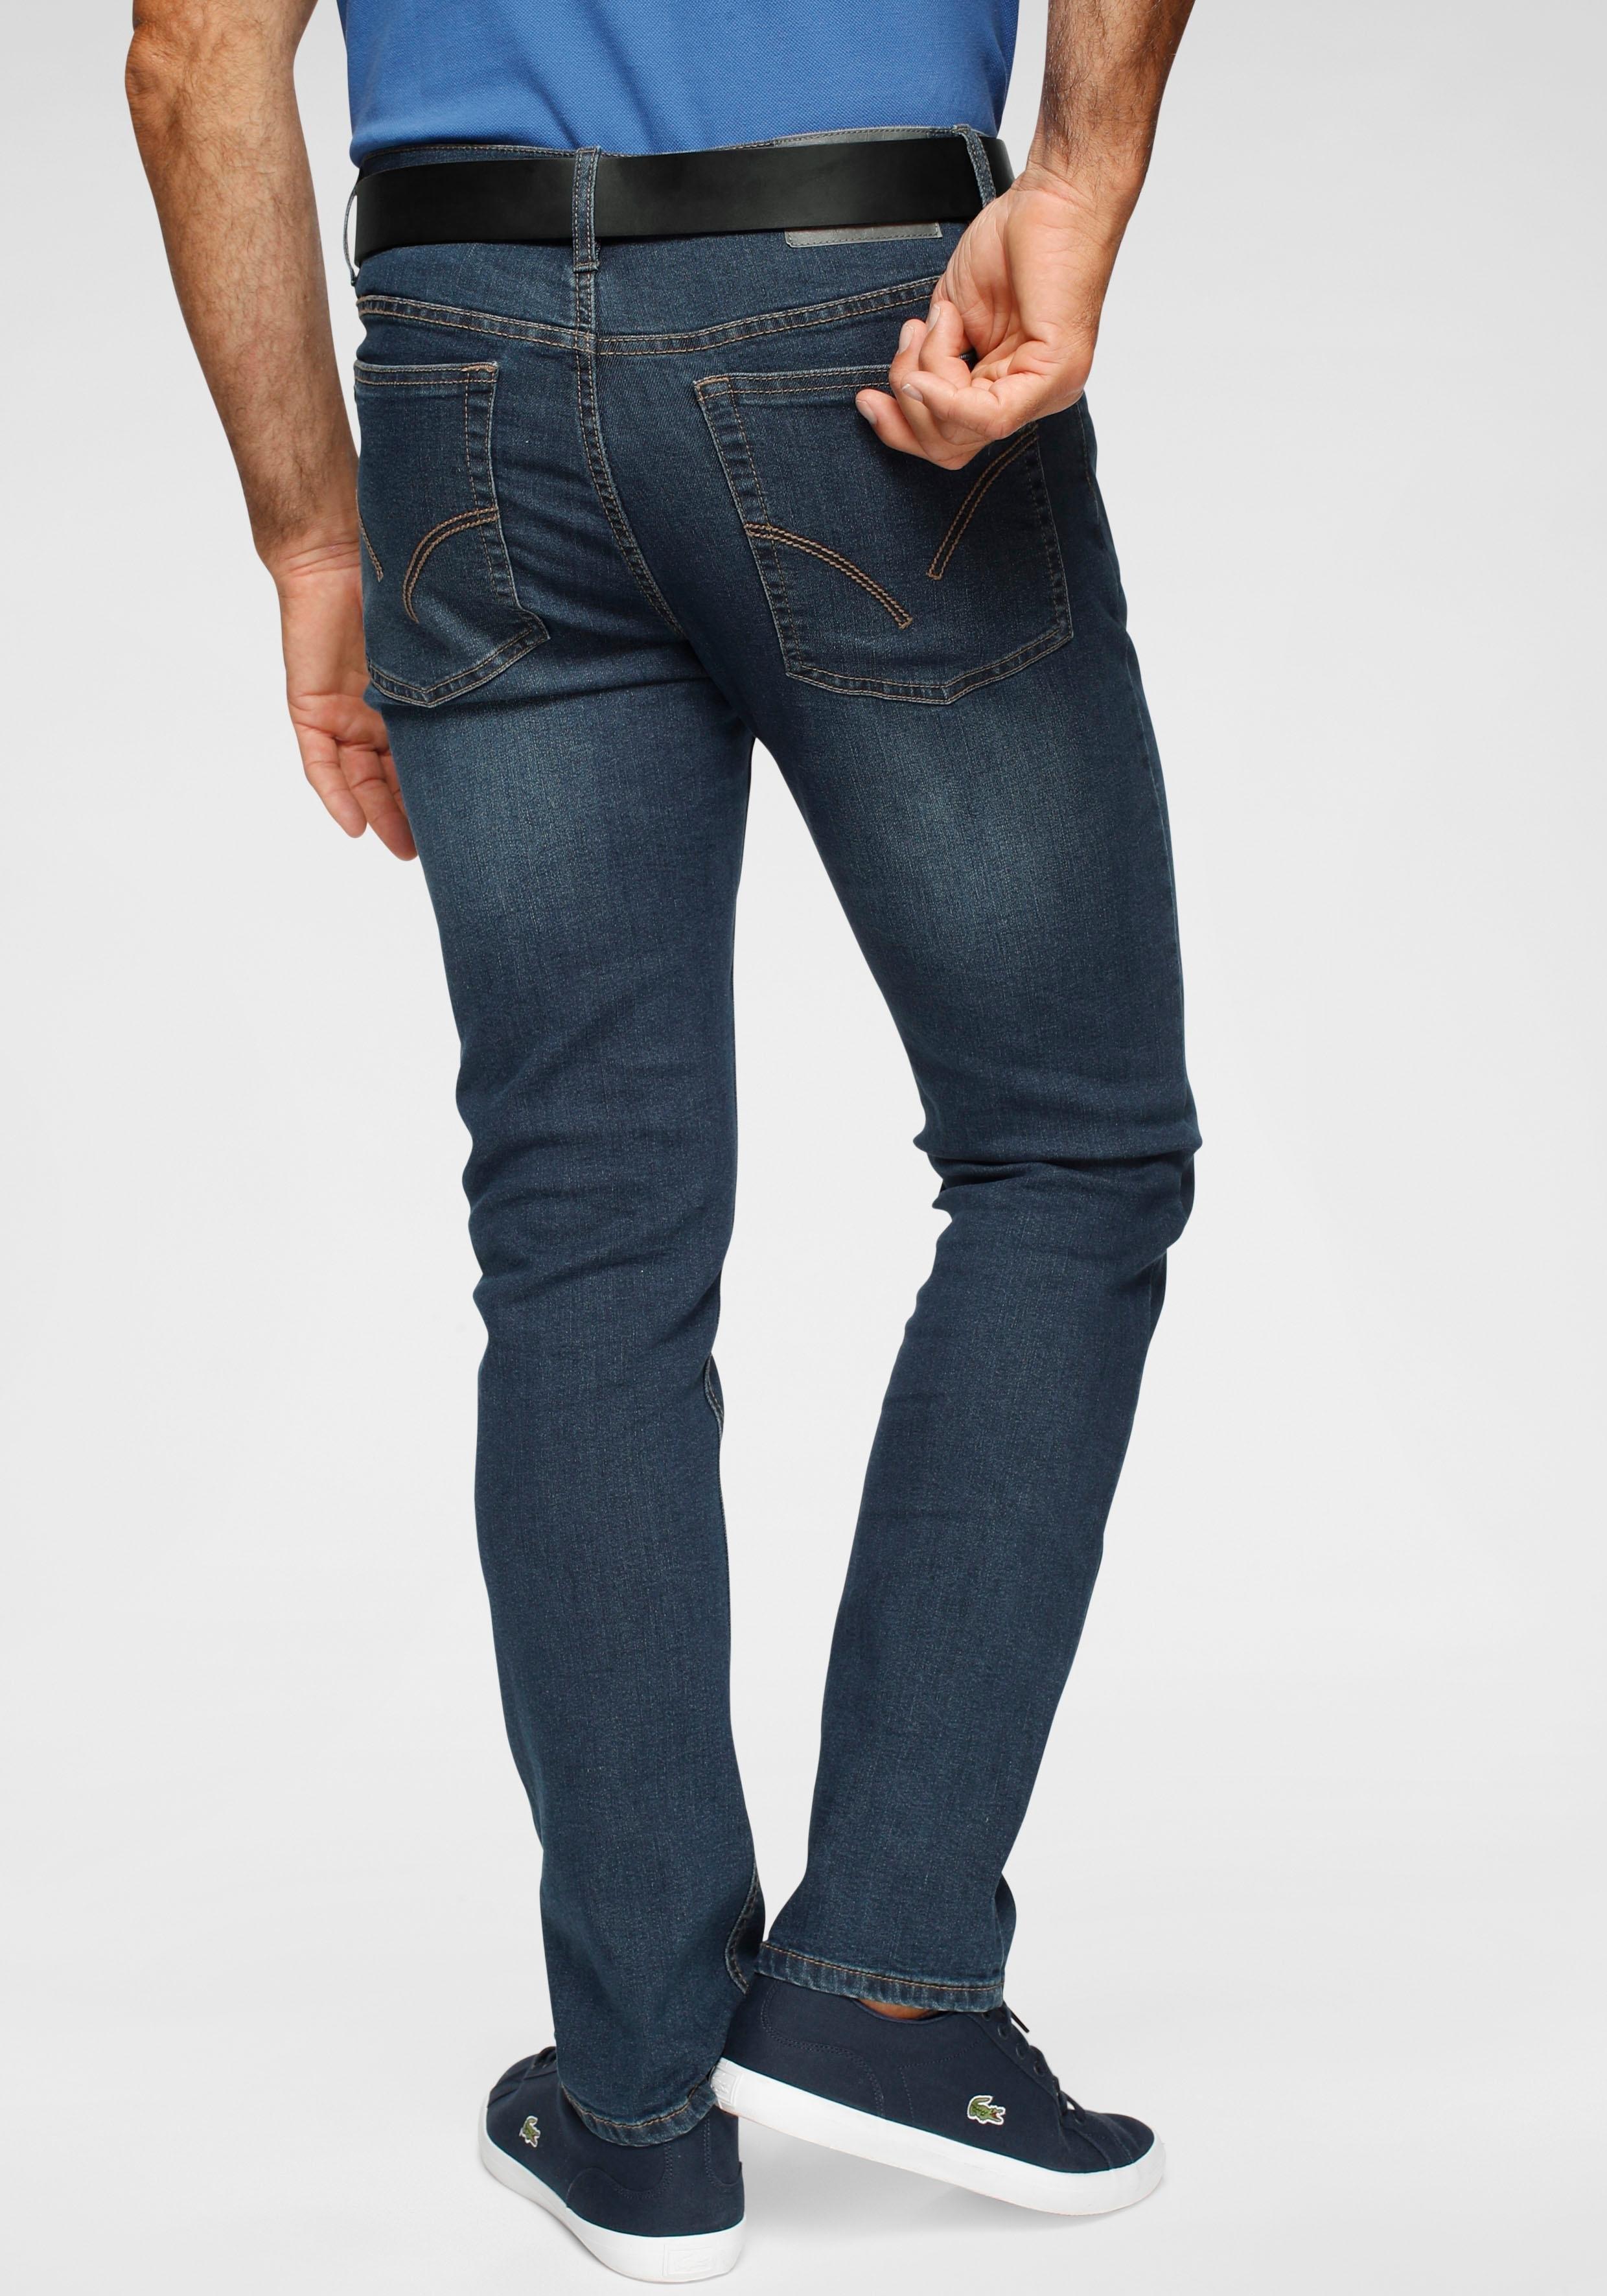 Arizona straight jeans met gerecycled polyesteraandeel - gratis ruilen op otto.nl